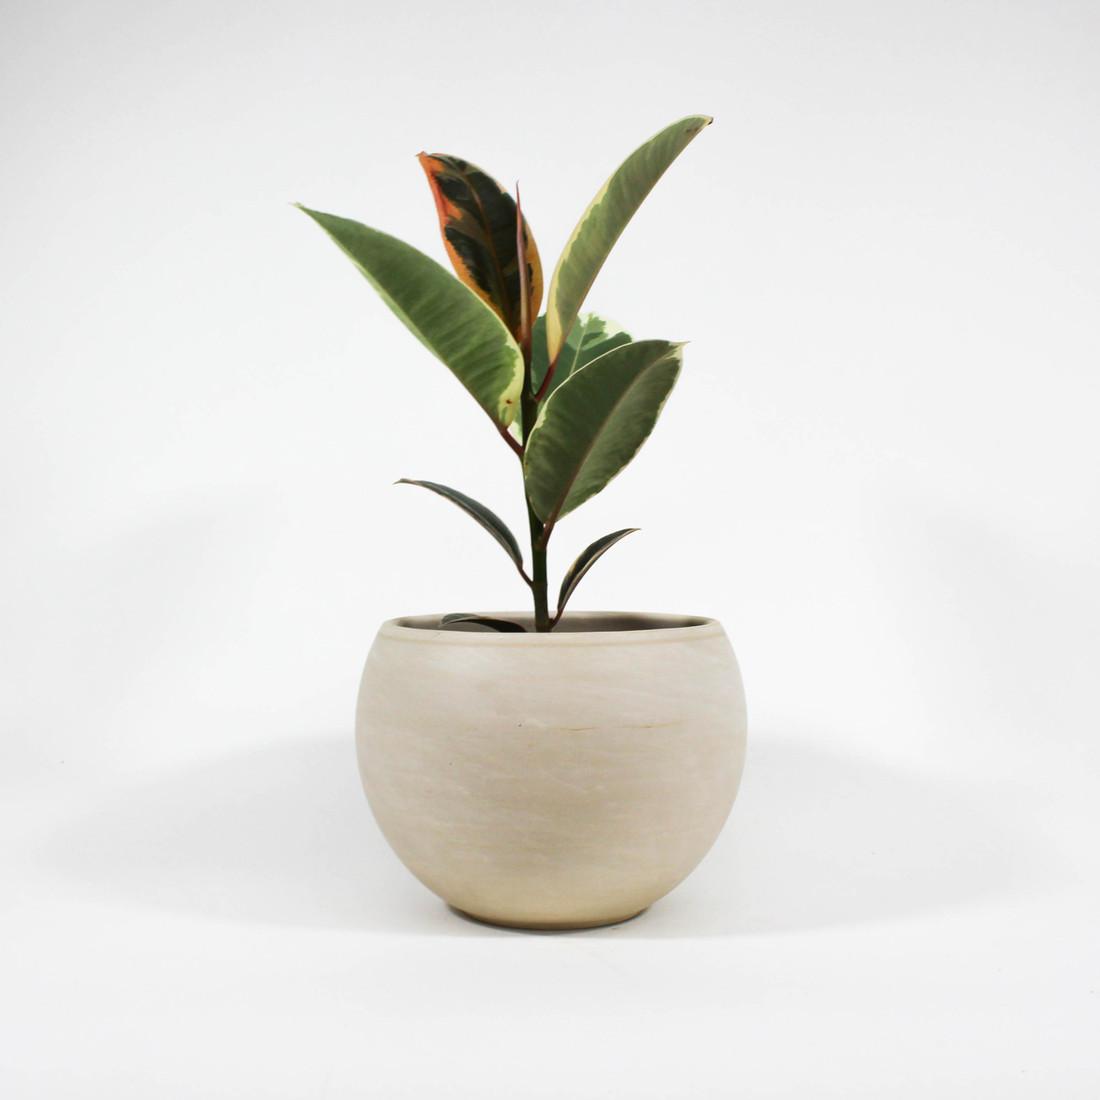 Ficus Elastica 'Tineke' in ceramic pot